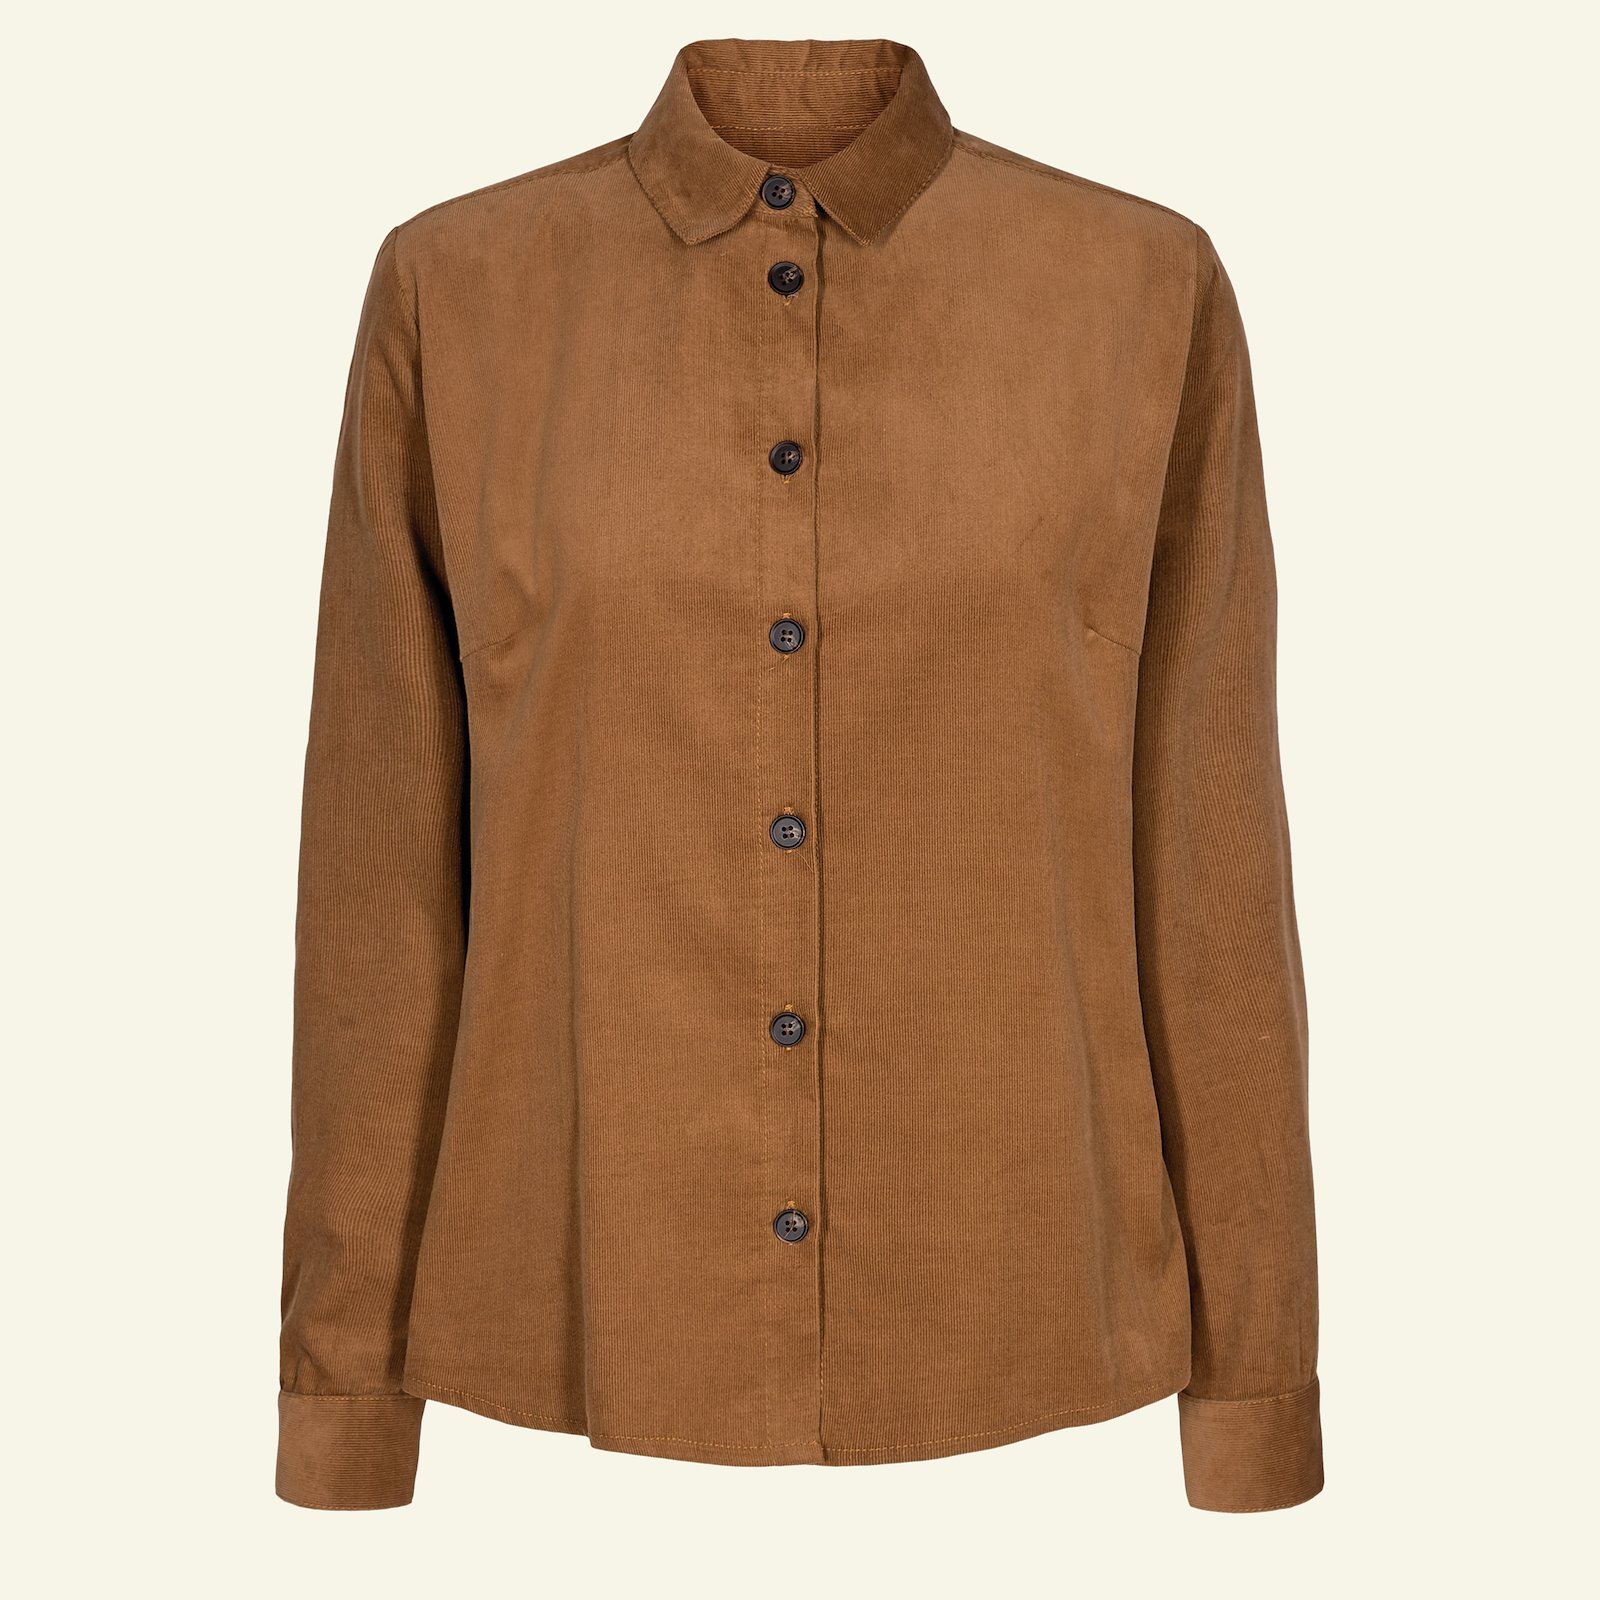 Shirt and shirtdress, 42/14 p23156_430823_sskit